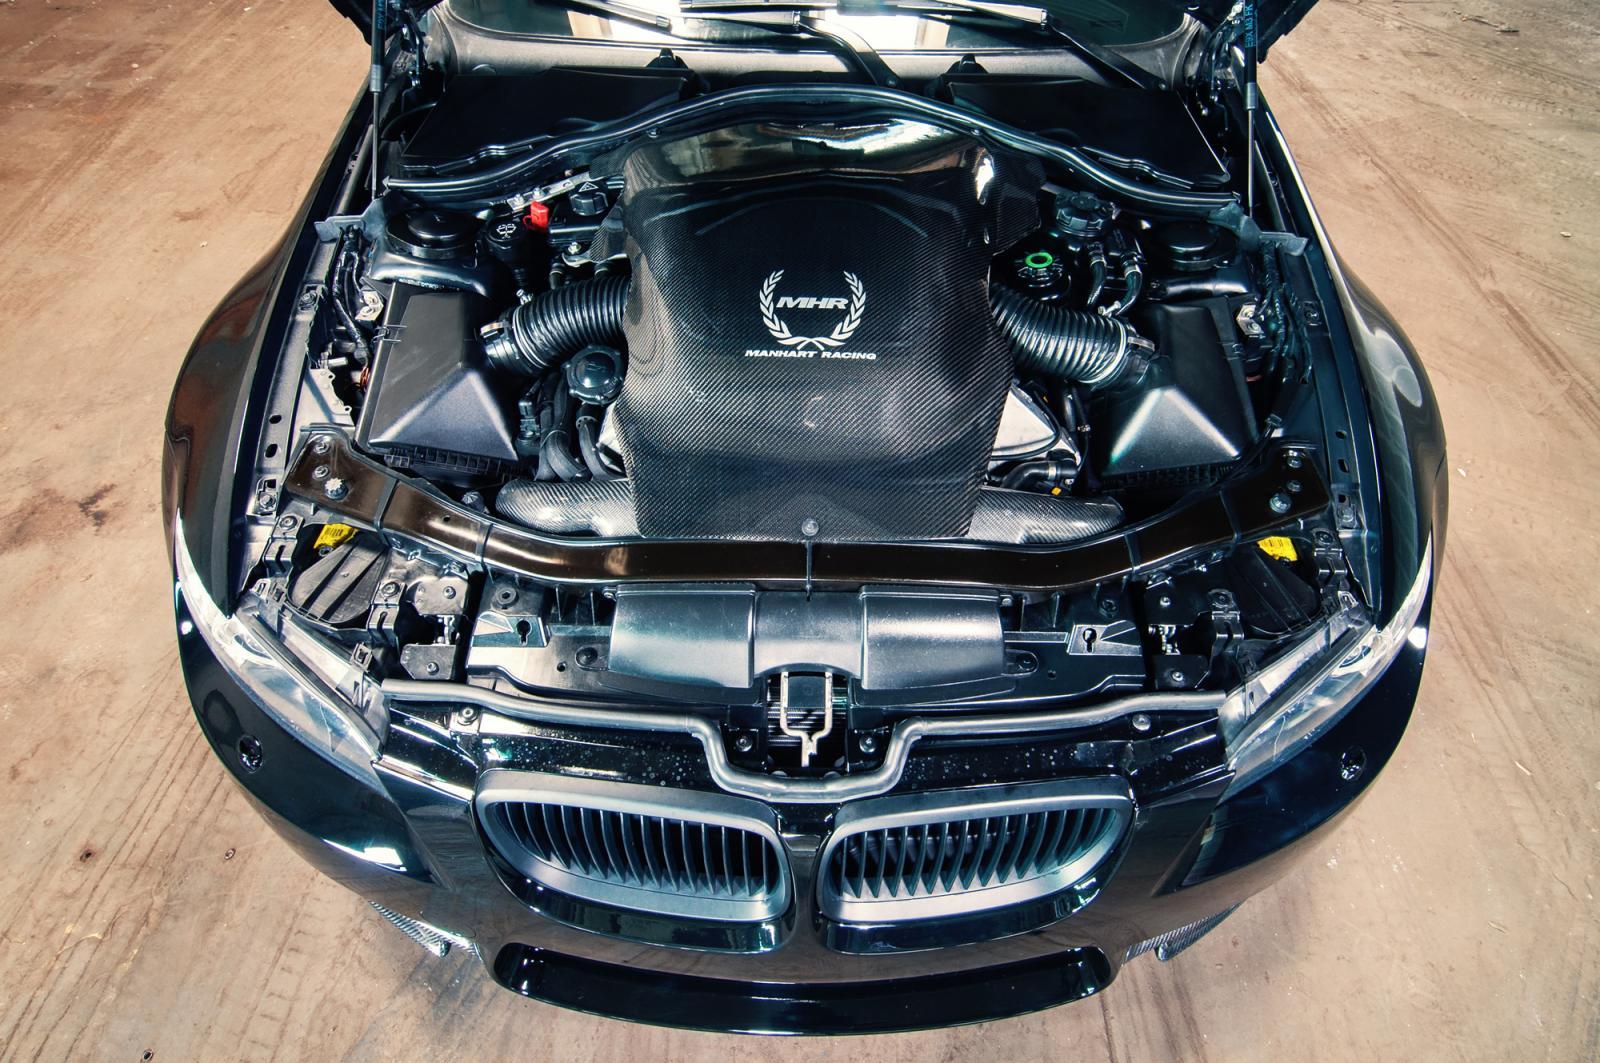 Manhart MH3 V8 R Biturbo E93 BMW M3